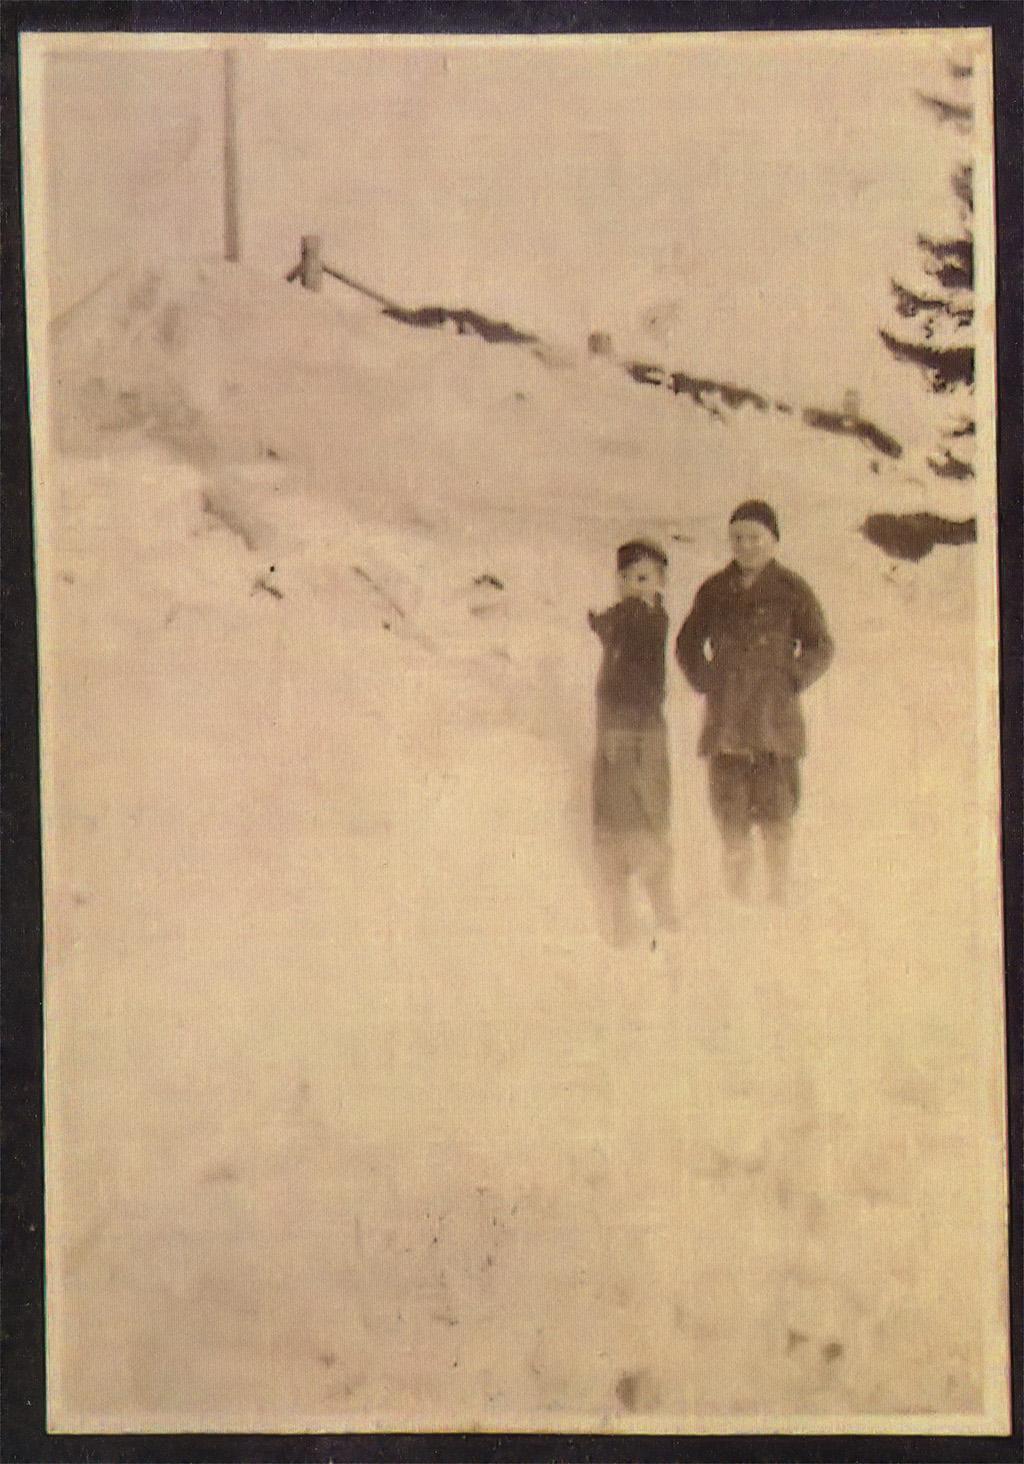 Winter of 1921-22